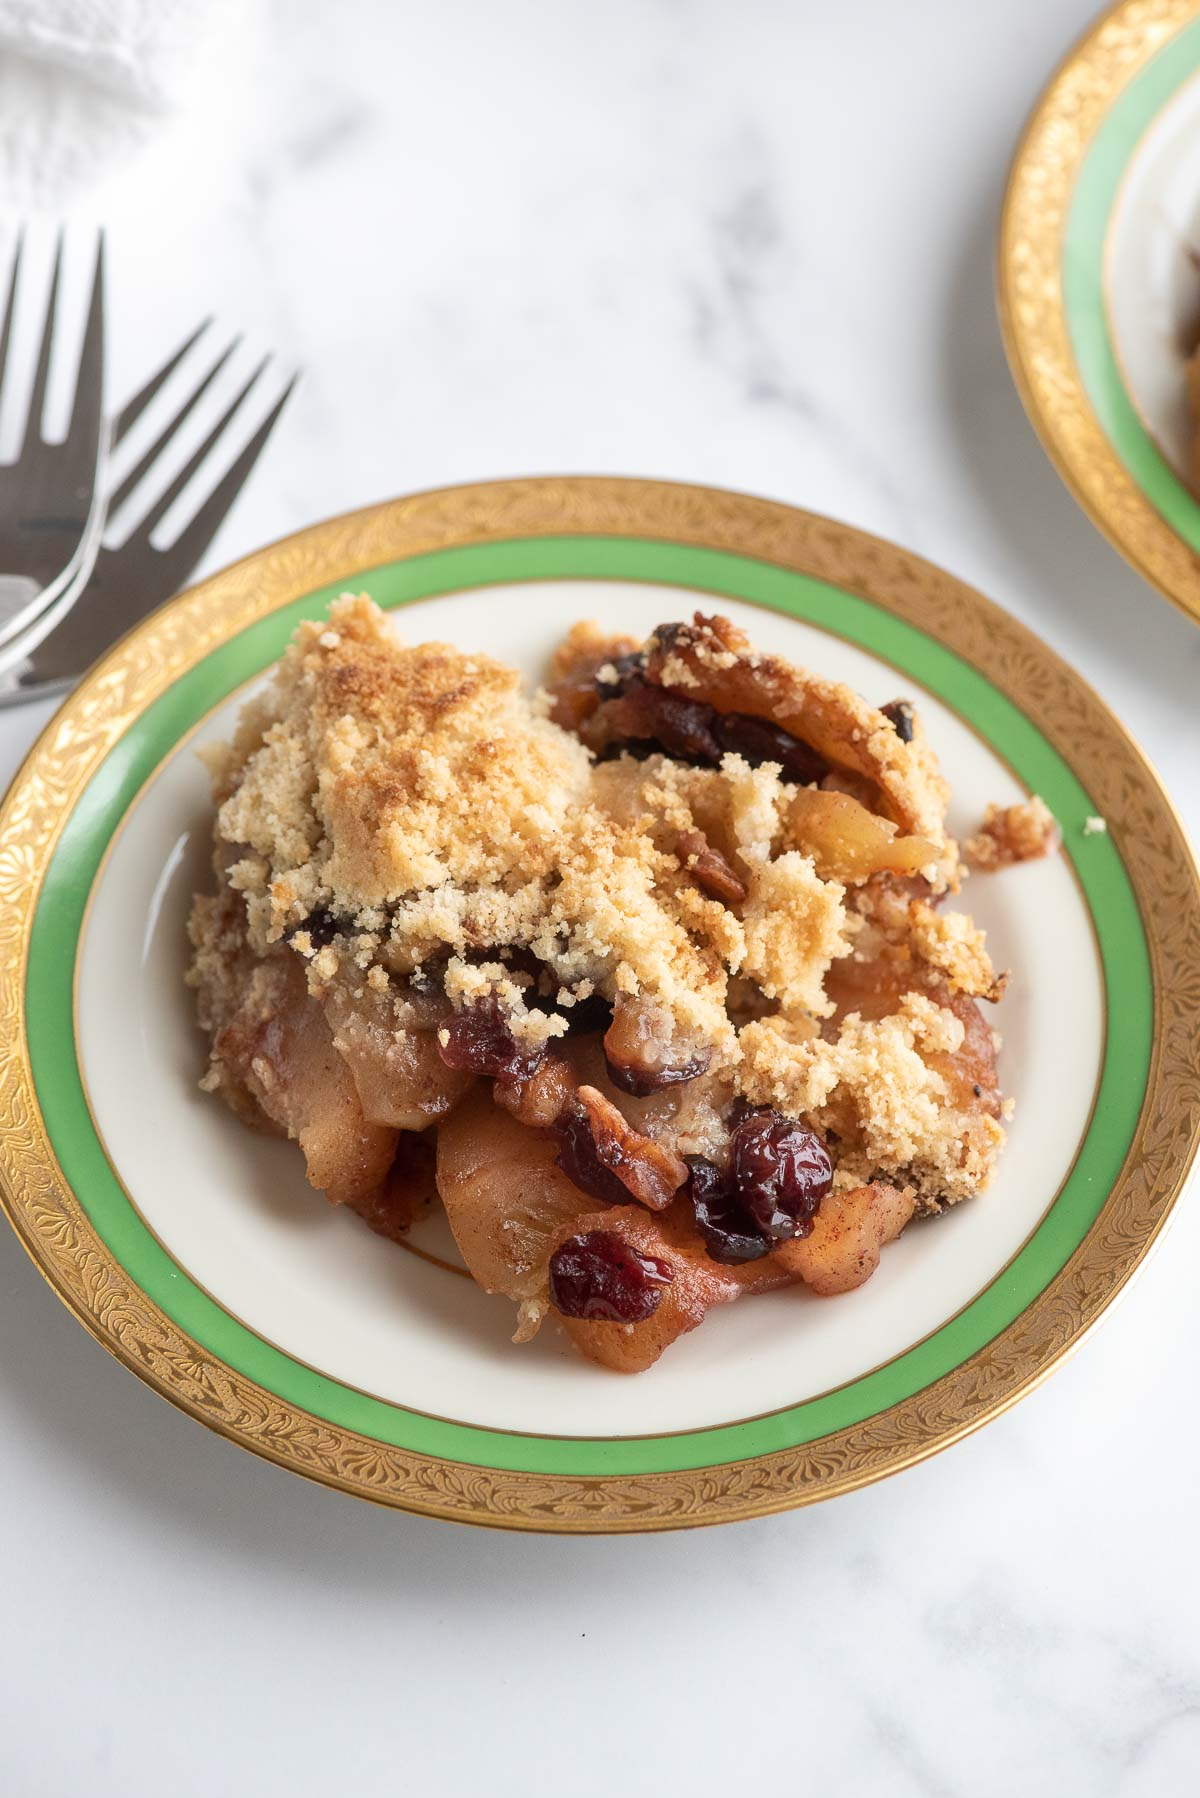 apple crisp serving on plate